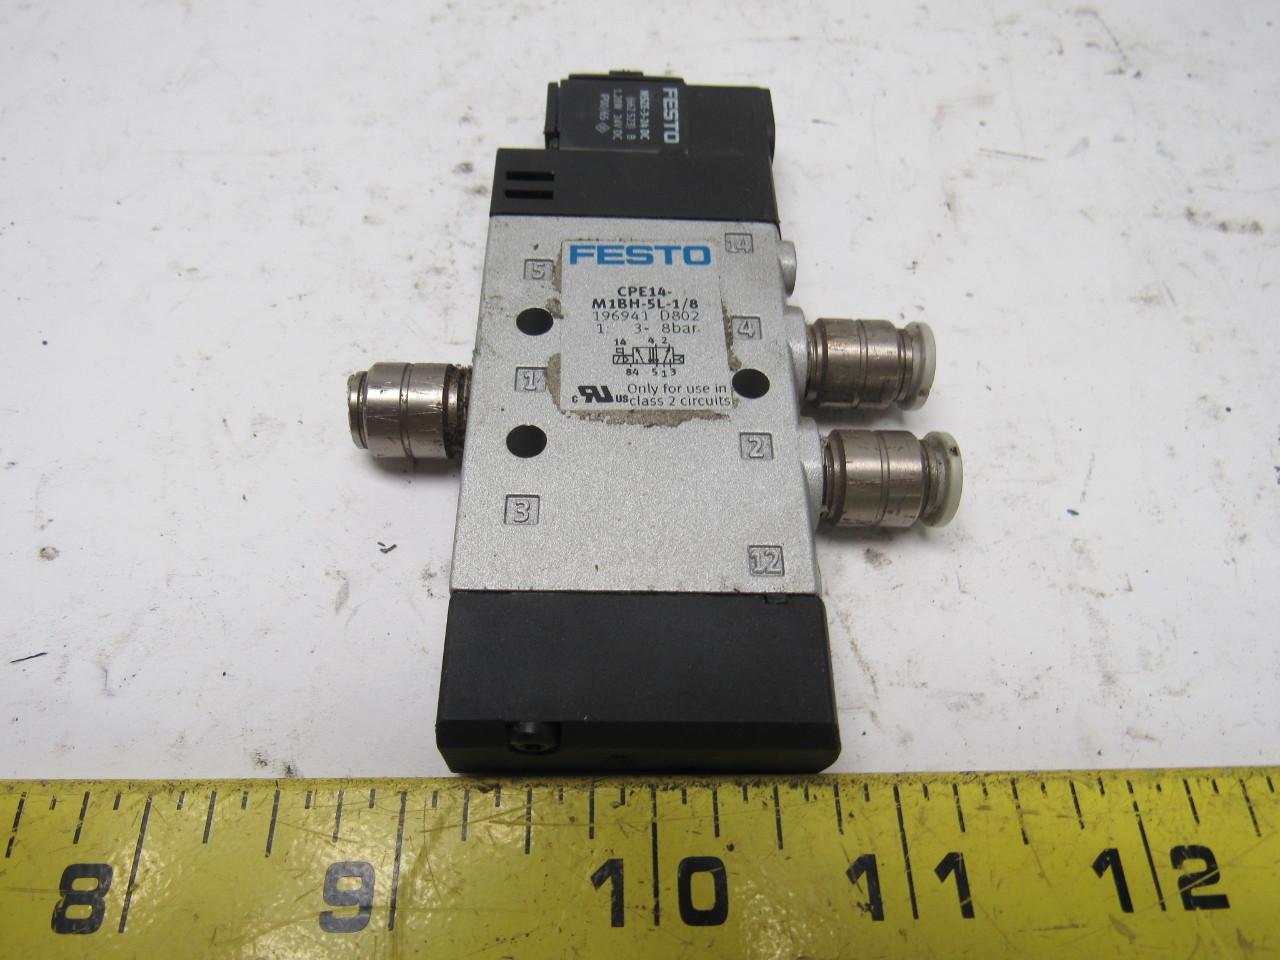 hight resolution of home festo limit switch wire diagram 2 festo pneumatic valves festo pneumatic valves festo cpe14 m1bh 5l 1 8 pneumatic directional control valve 24vdc